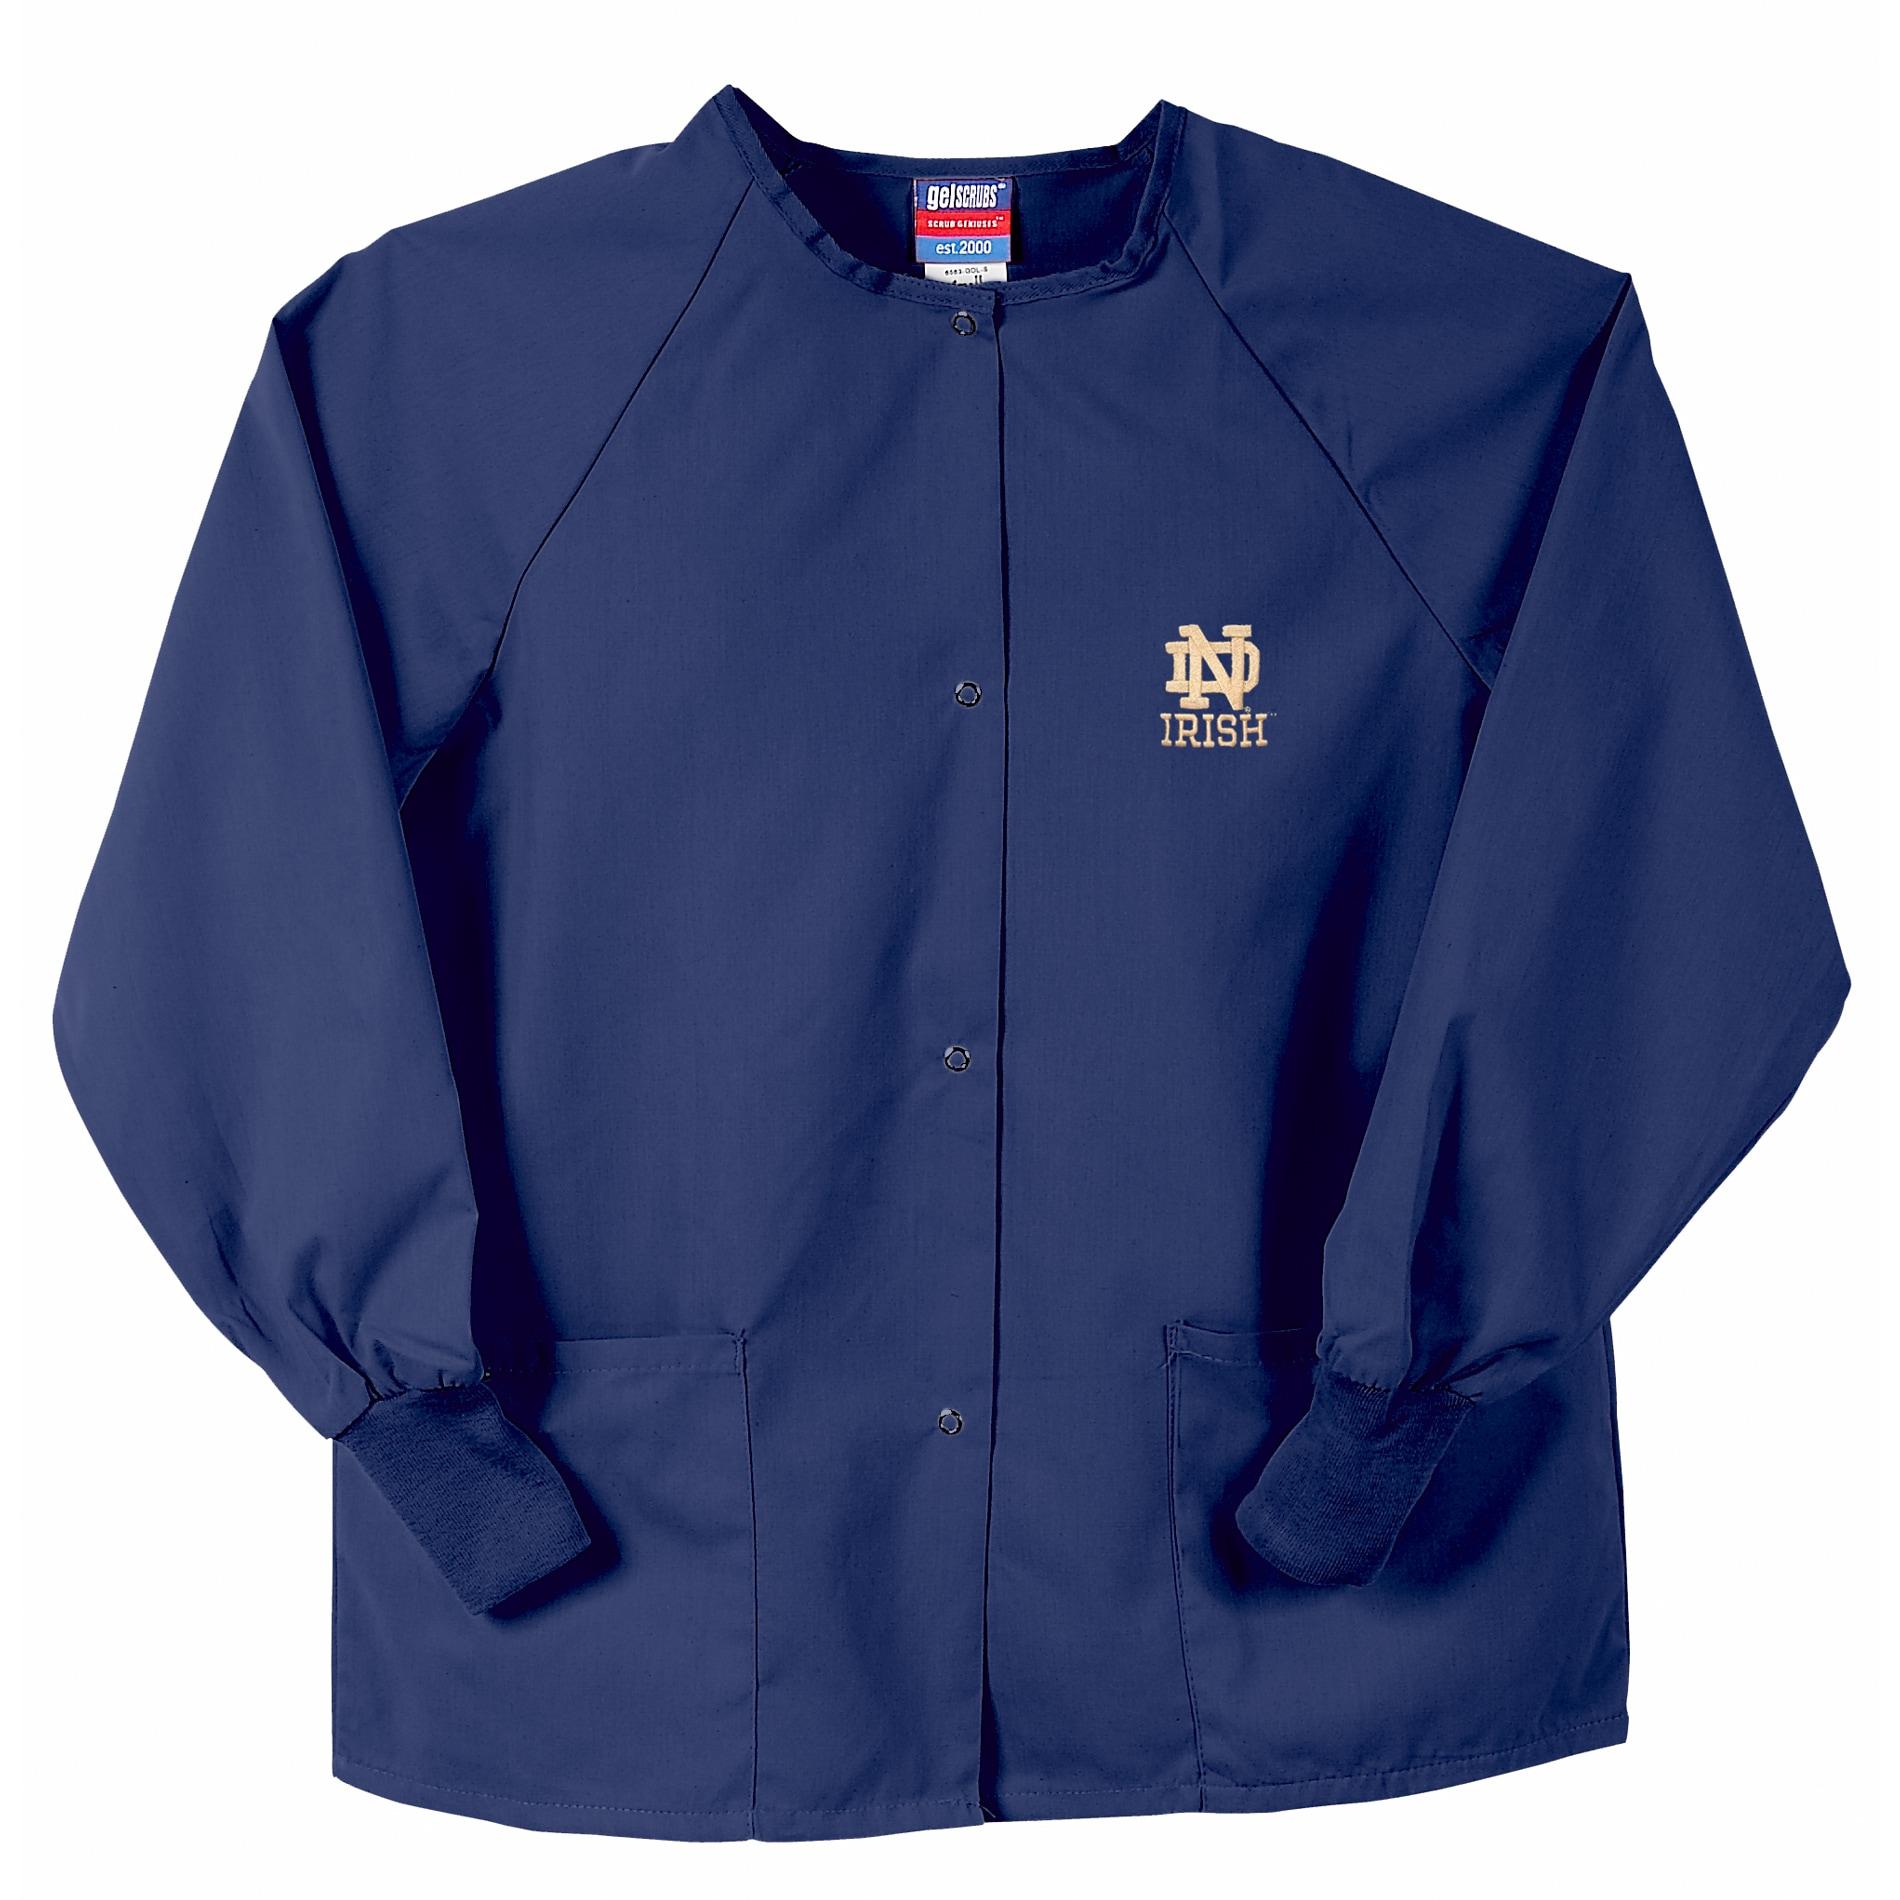 Gelscrubs Navy Notre Dame Fighting Irish Long-Sleeve Nurse Jacket